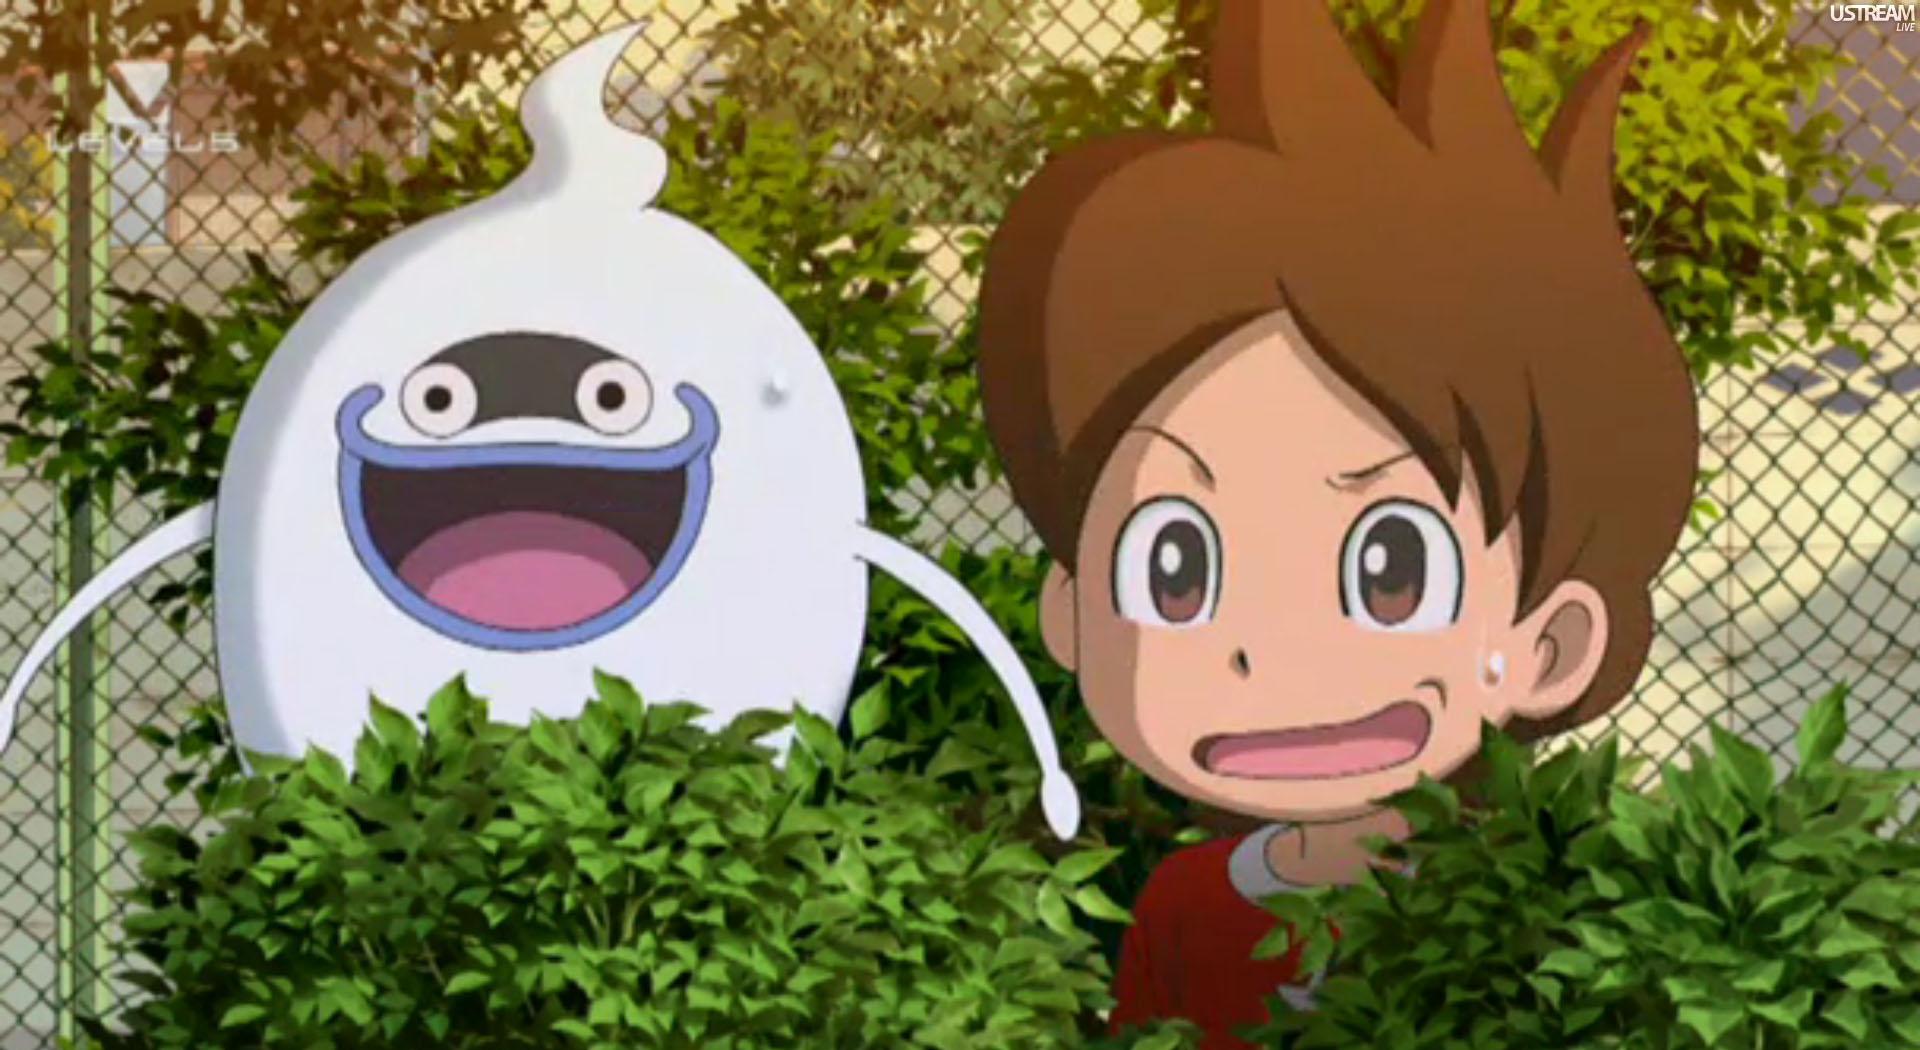 More Akihiro Hino Anime Level 5 Top Youkai Watch